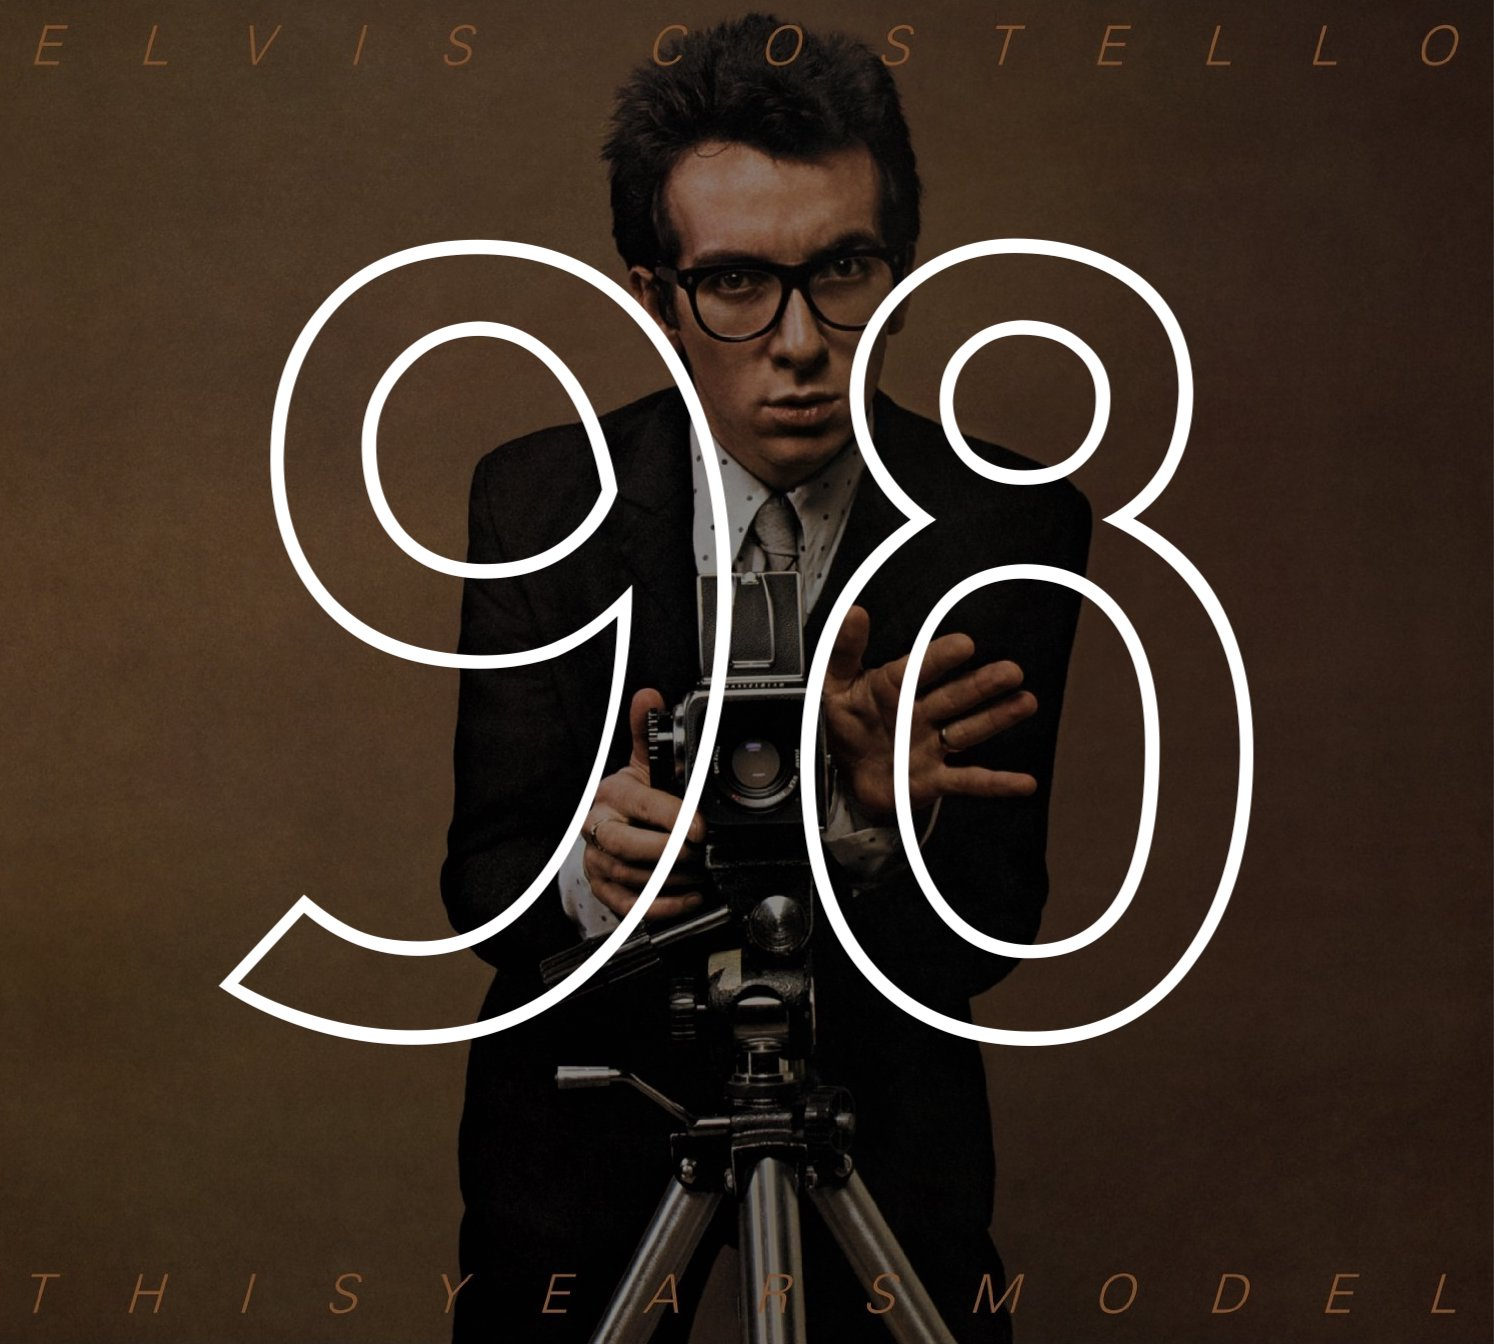 98 This Year's Model.jpg